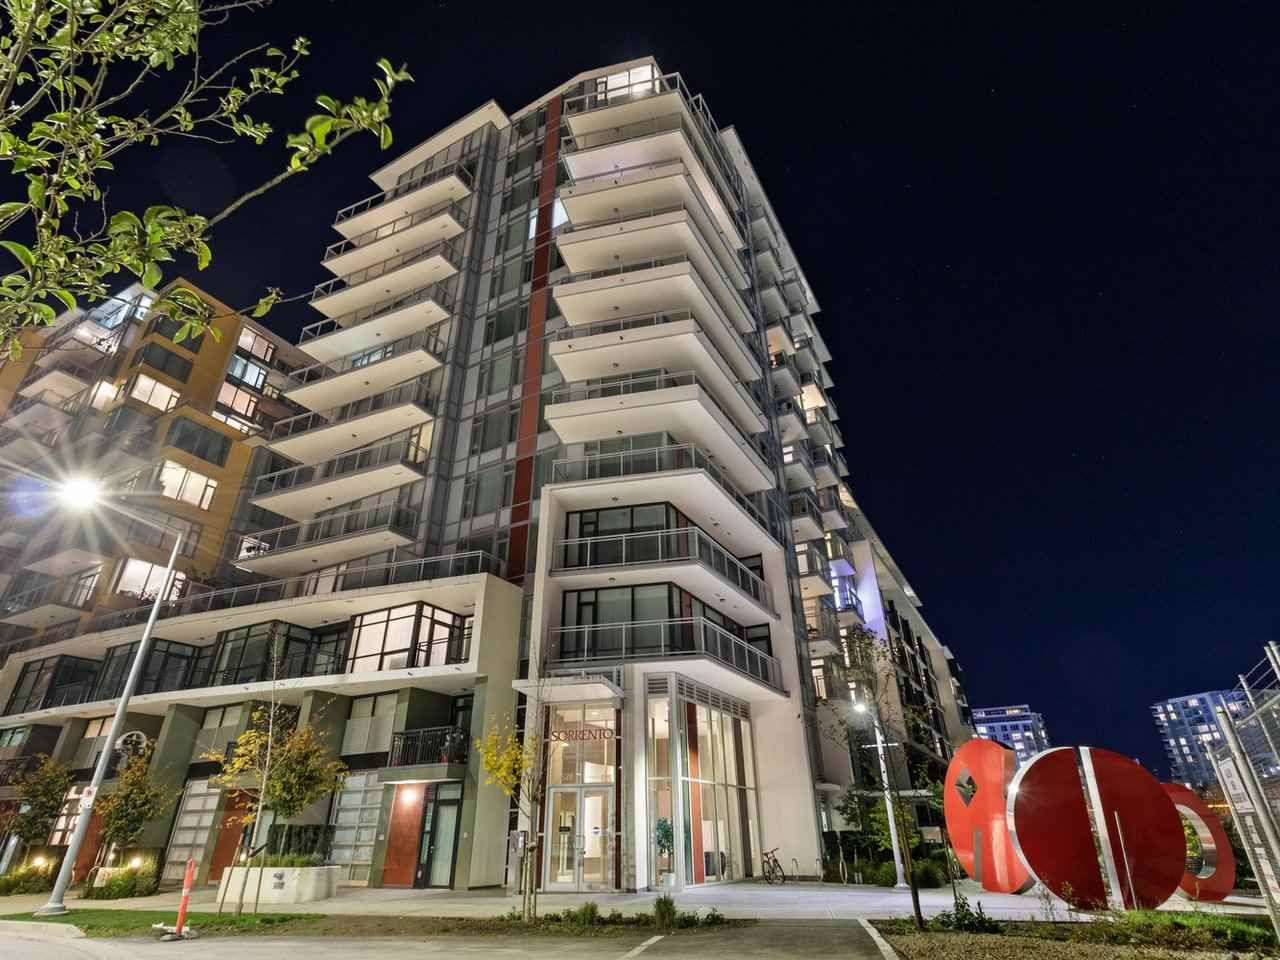 Main Photo: 1107 8628 HAZELBRIDGE Way in Richmond: West Cambie Condo for sale : MLS®# R2516316